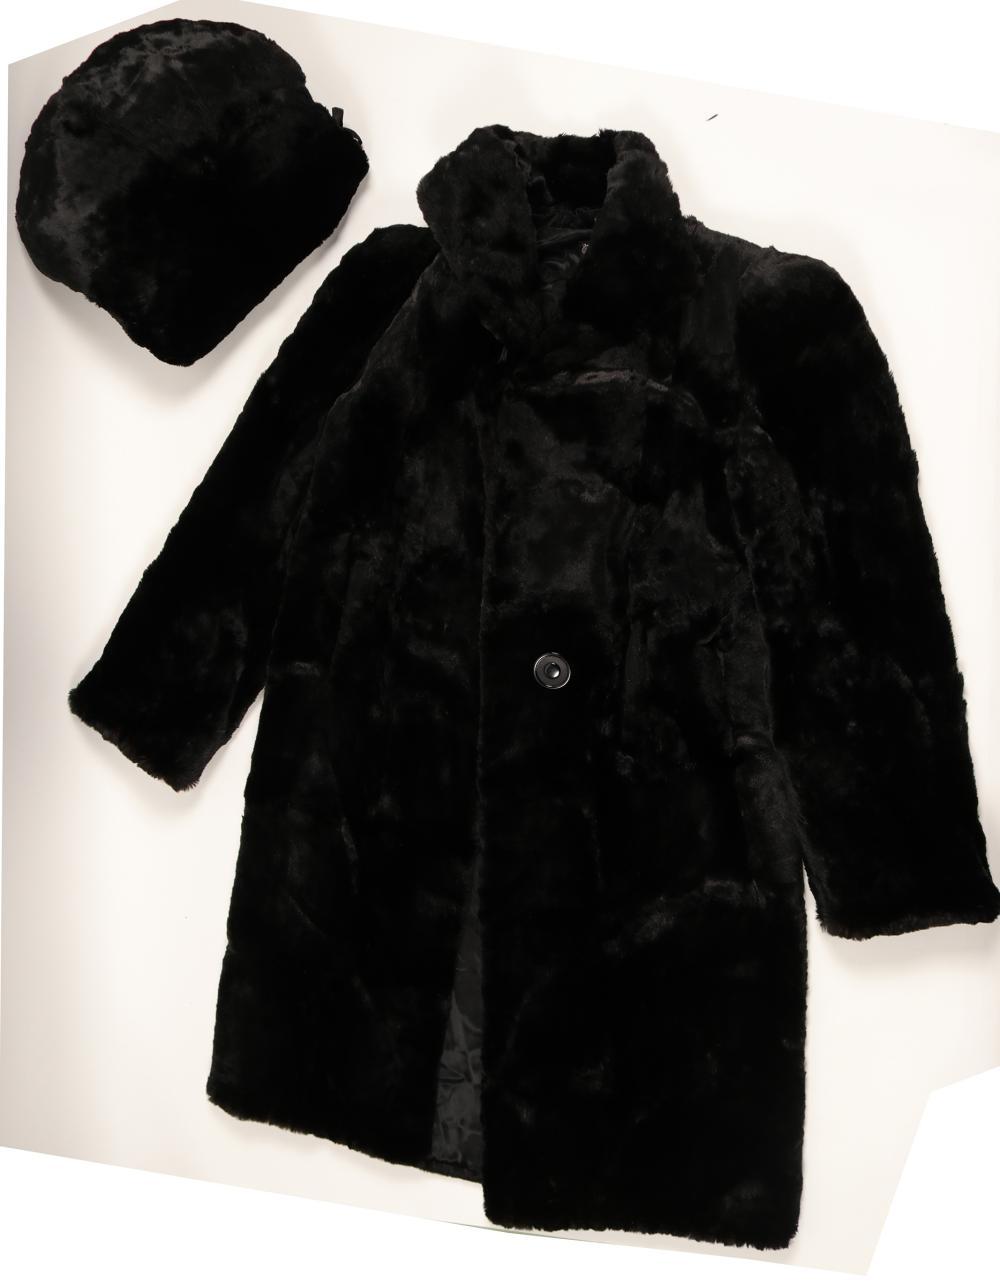 Coat, Ladies Short Nap, Black Fur with Fur Hand Warmers   (91340)